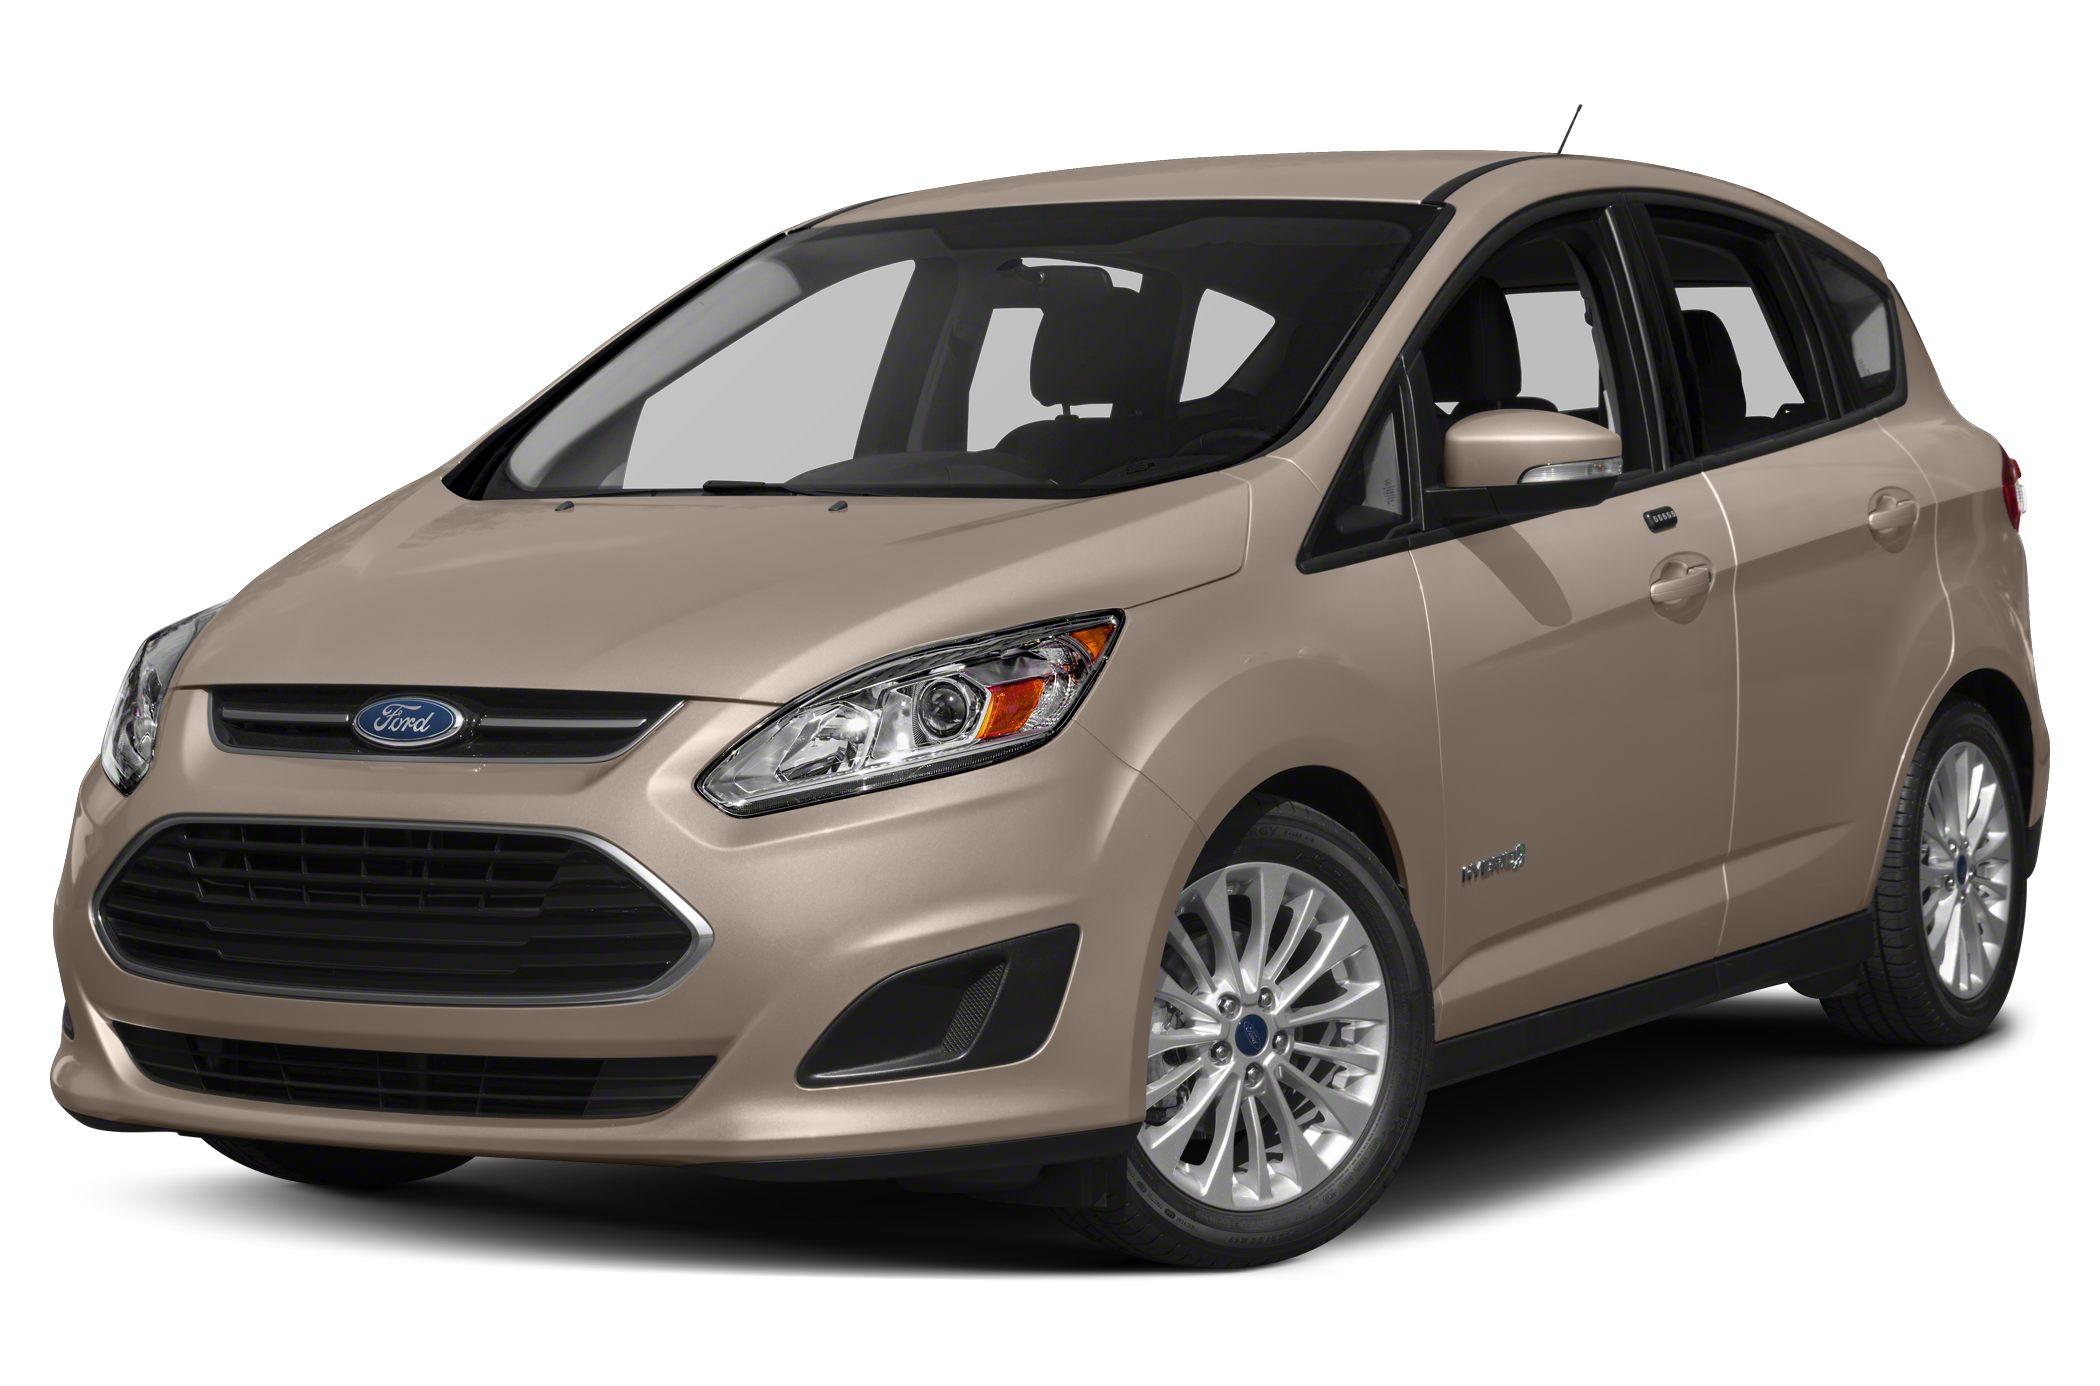 2017FordC-Max Hybrid